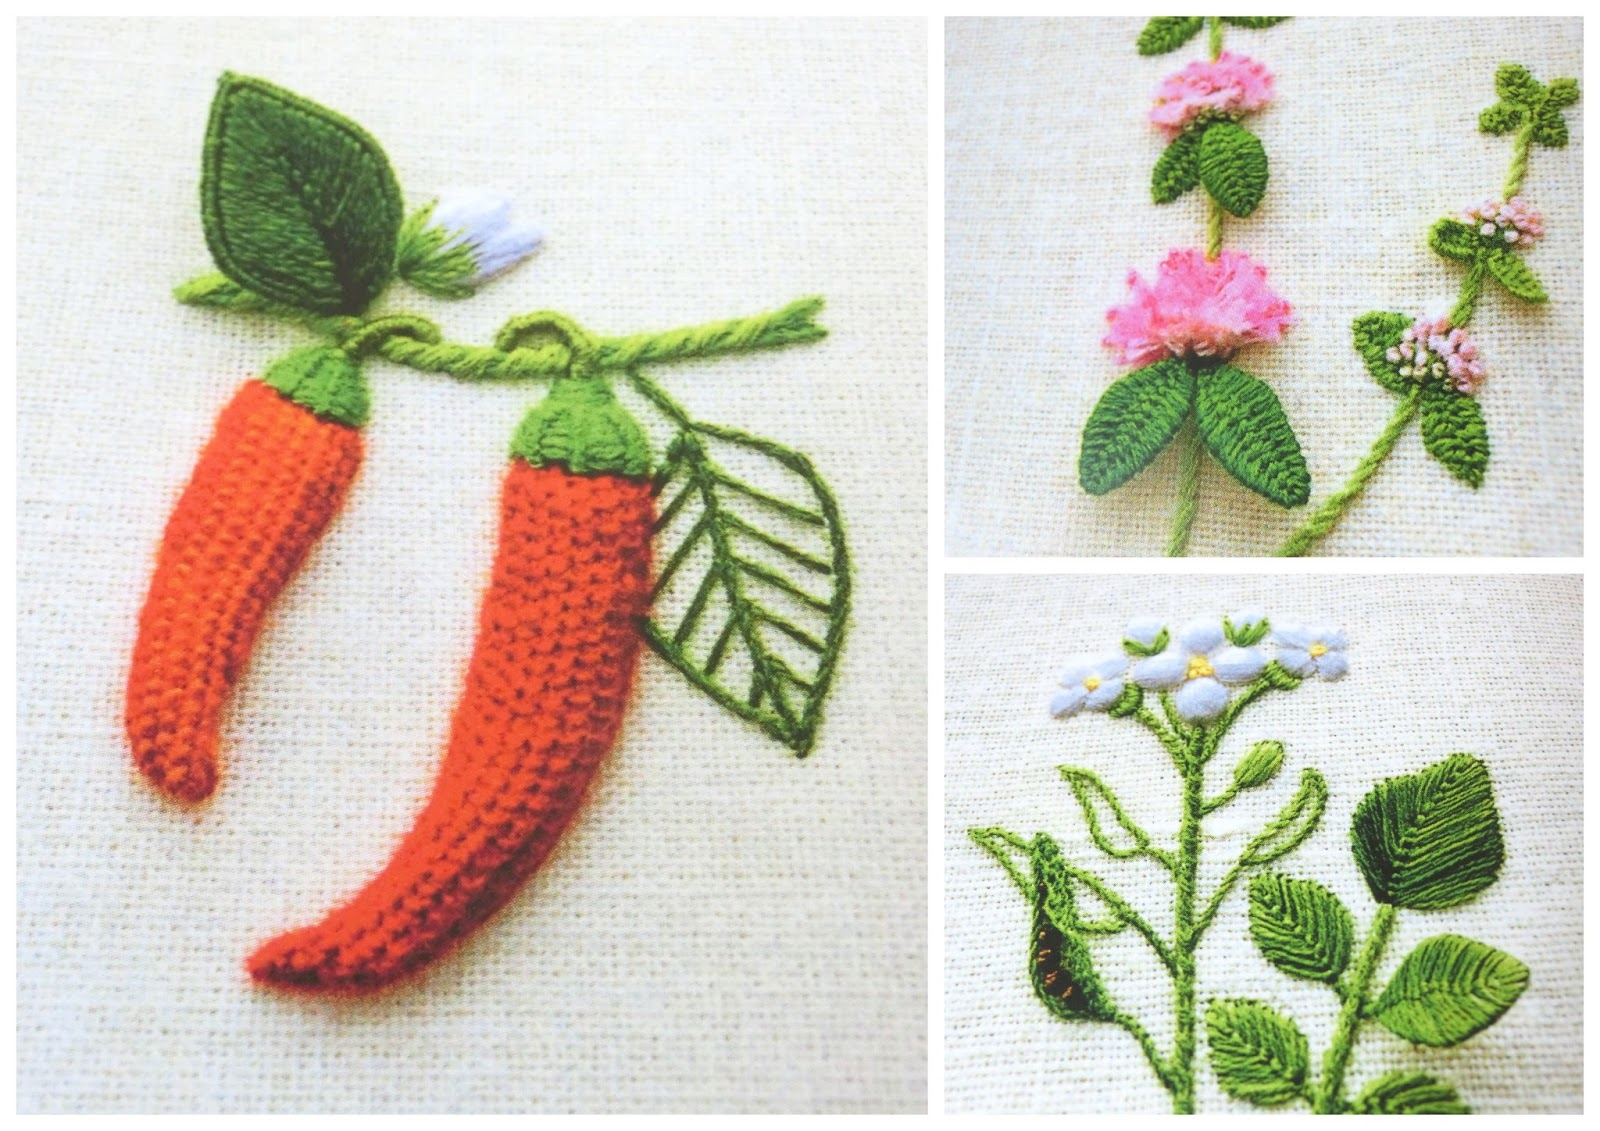 объемная вышивка, Сашико Моримото, Sachiko Morimoto,  книга Вышивка. Объемные цветы